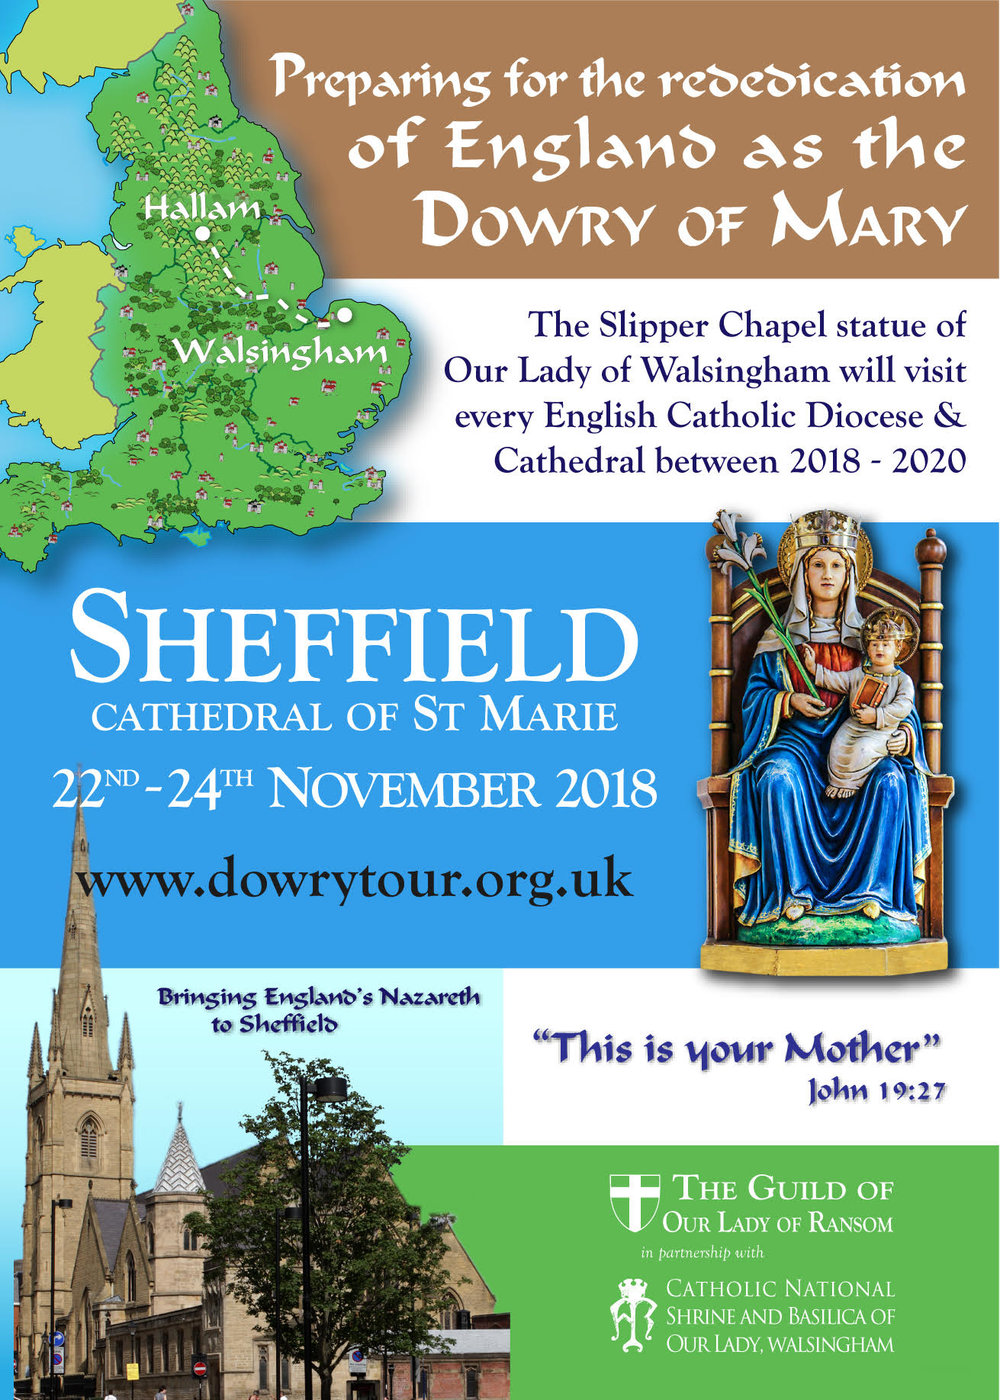 Dowry tour.jpg